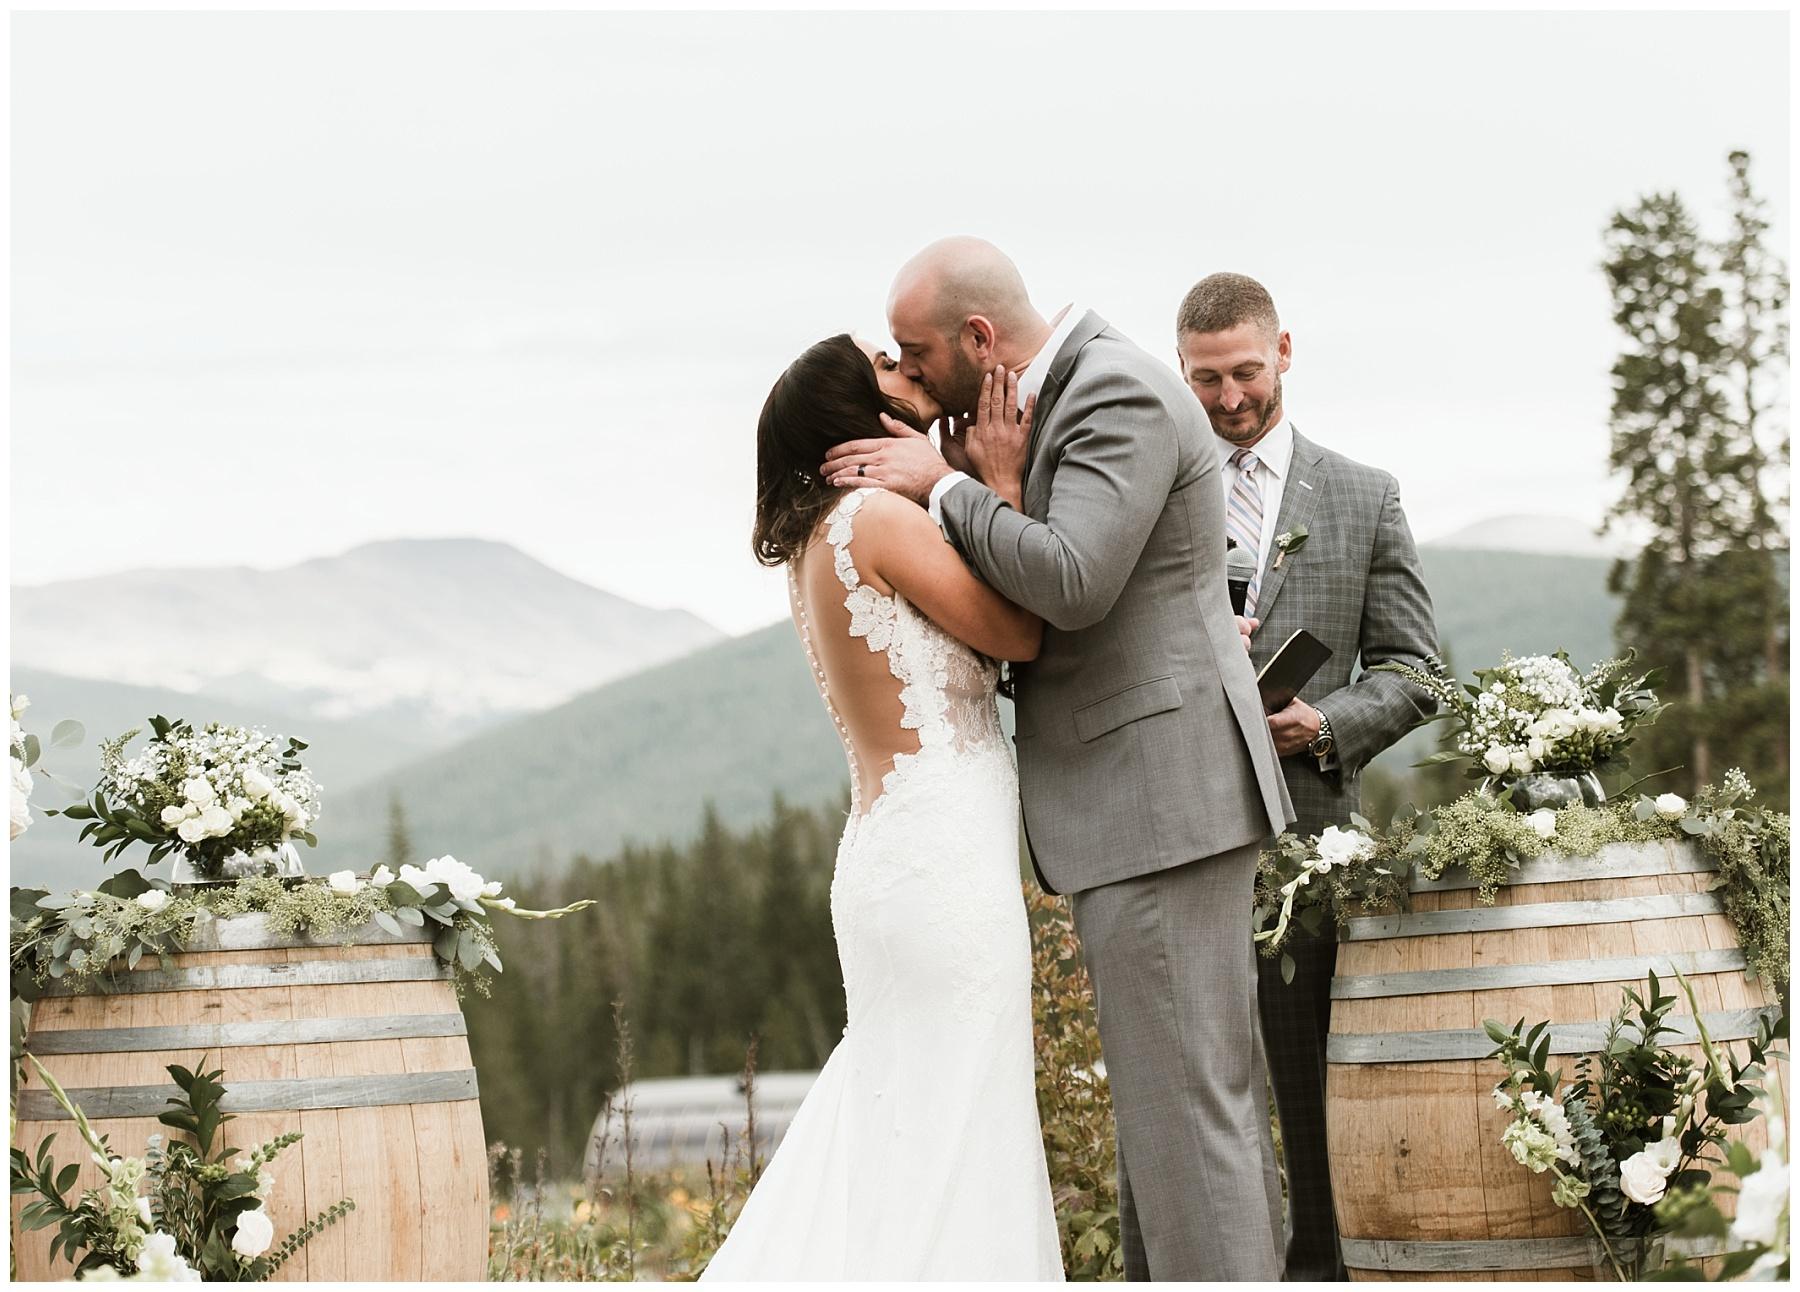 Katesalleyphotography-419_married in Breckenridge.jpg